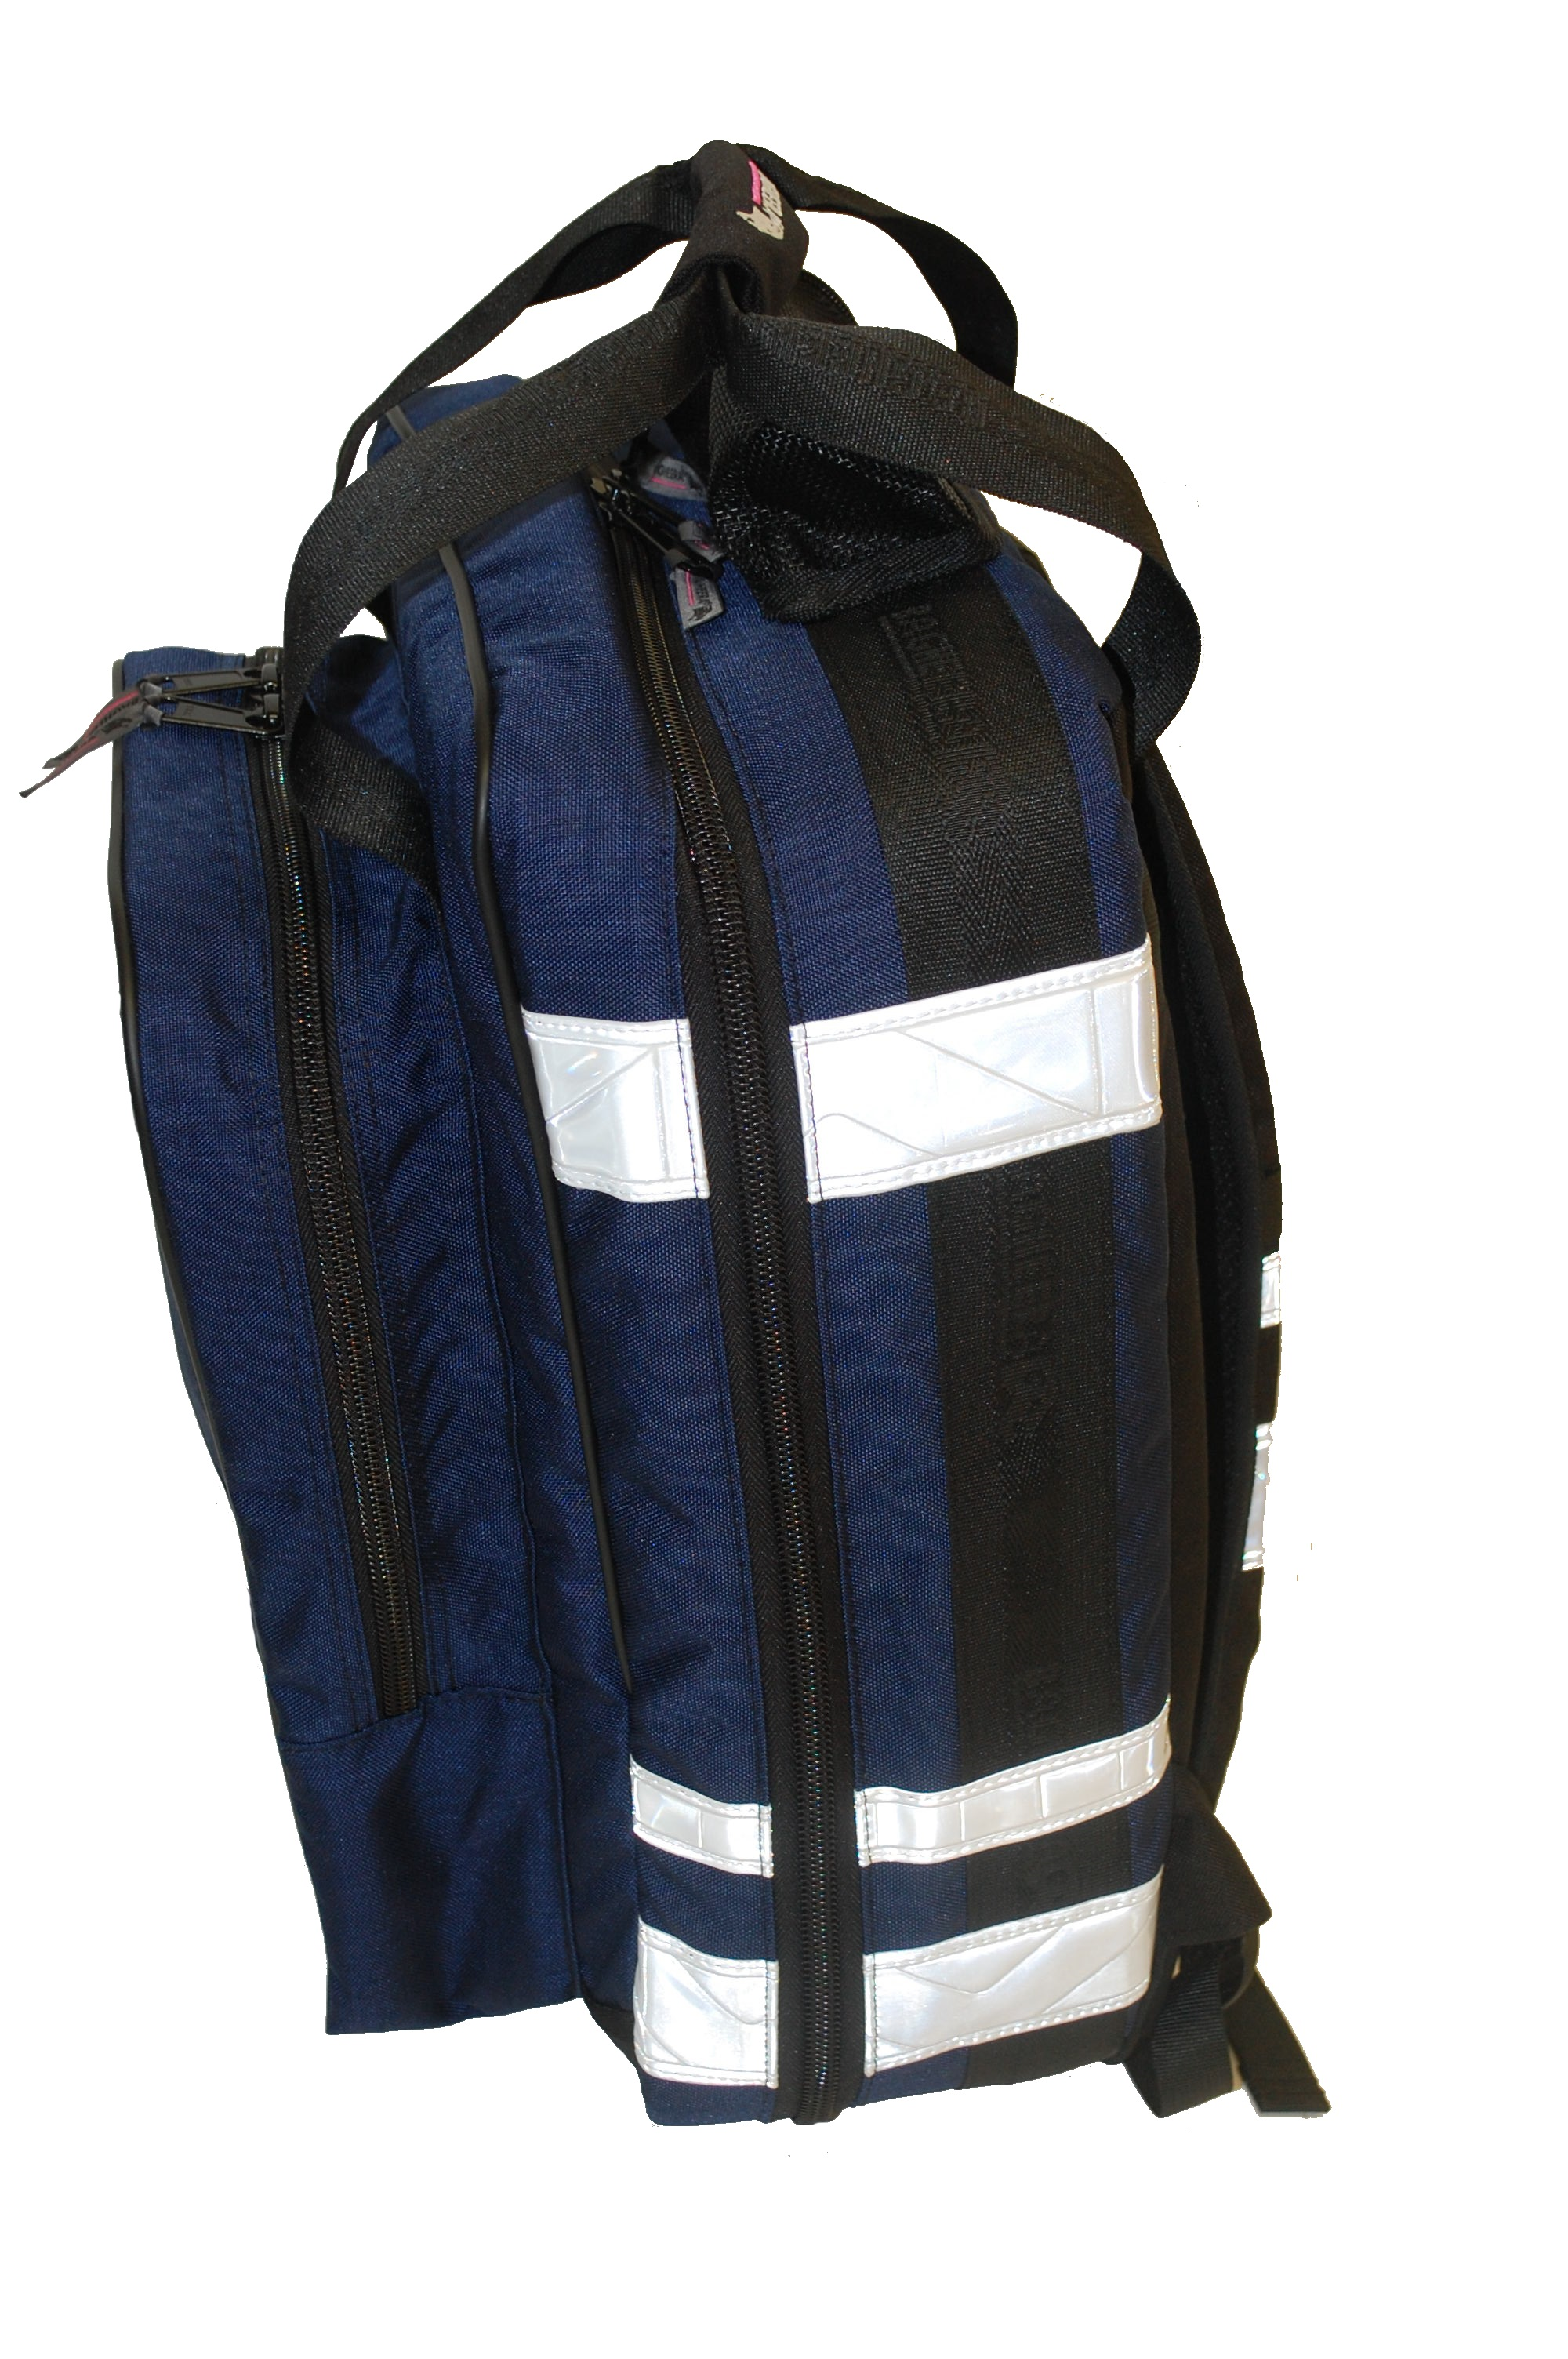 City Väskan : ?nge city deluxe help rescue